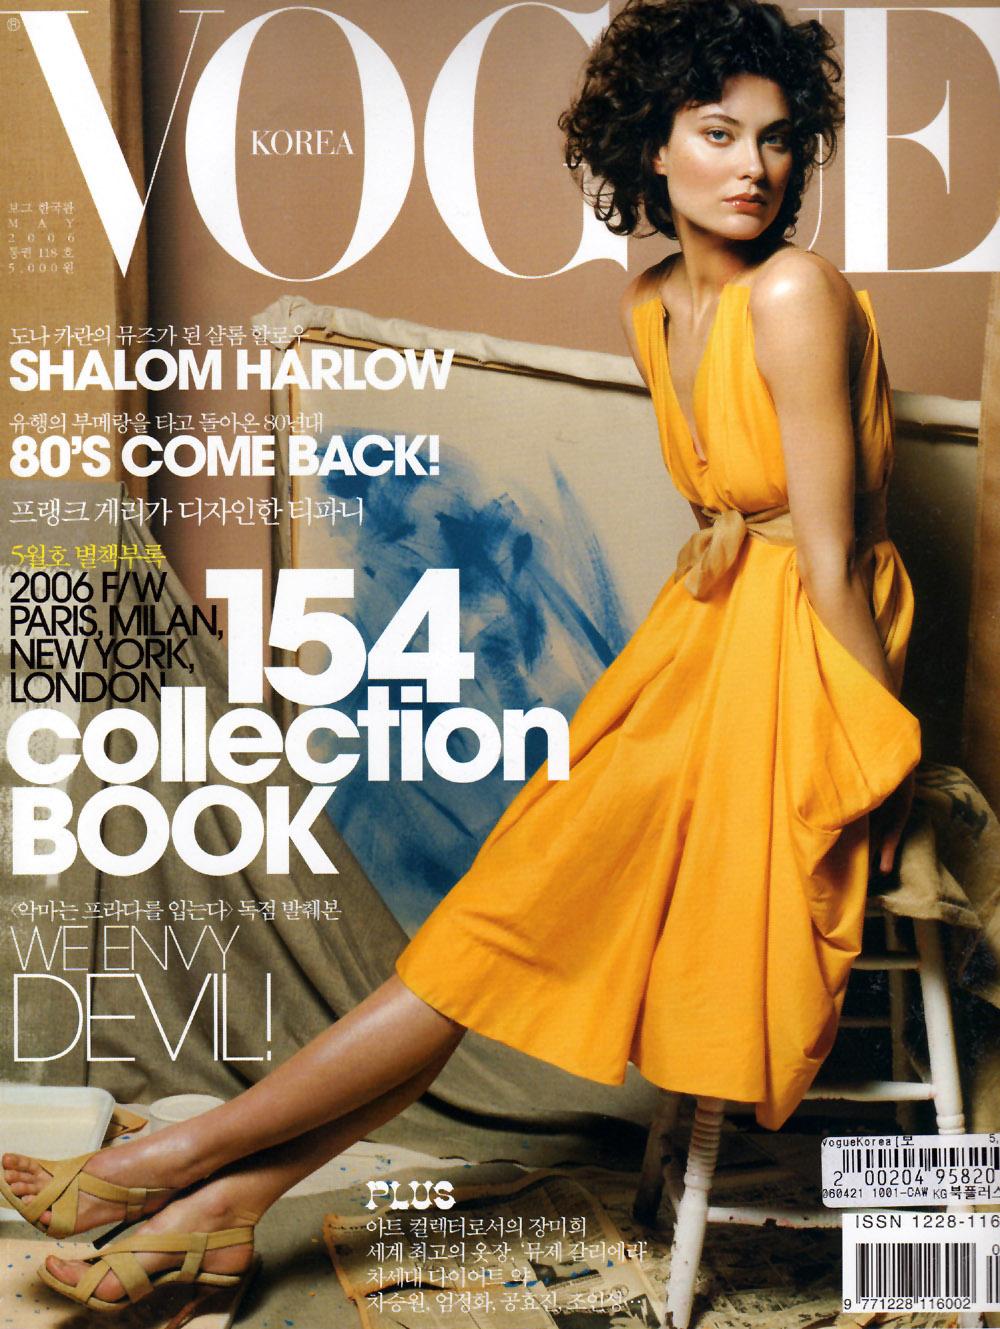 Shalom Harlow in Vogue Korea May 2006 (photography: Tesh)